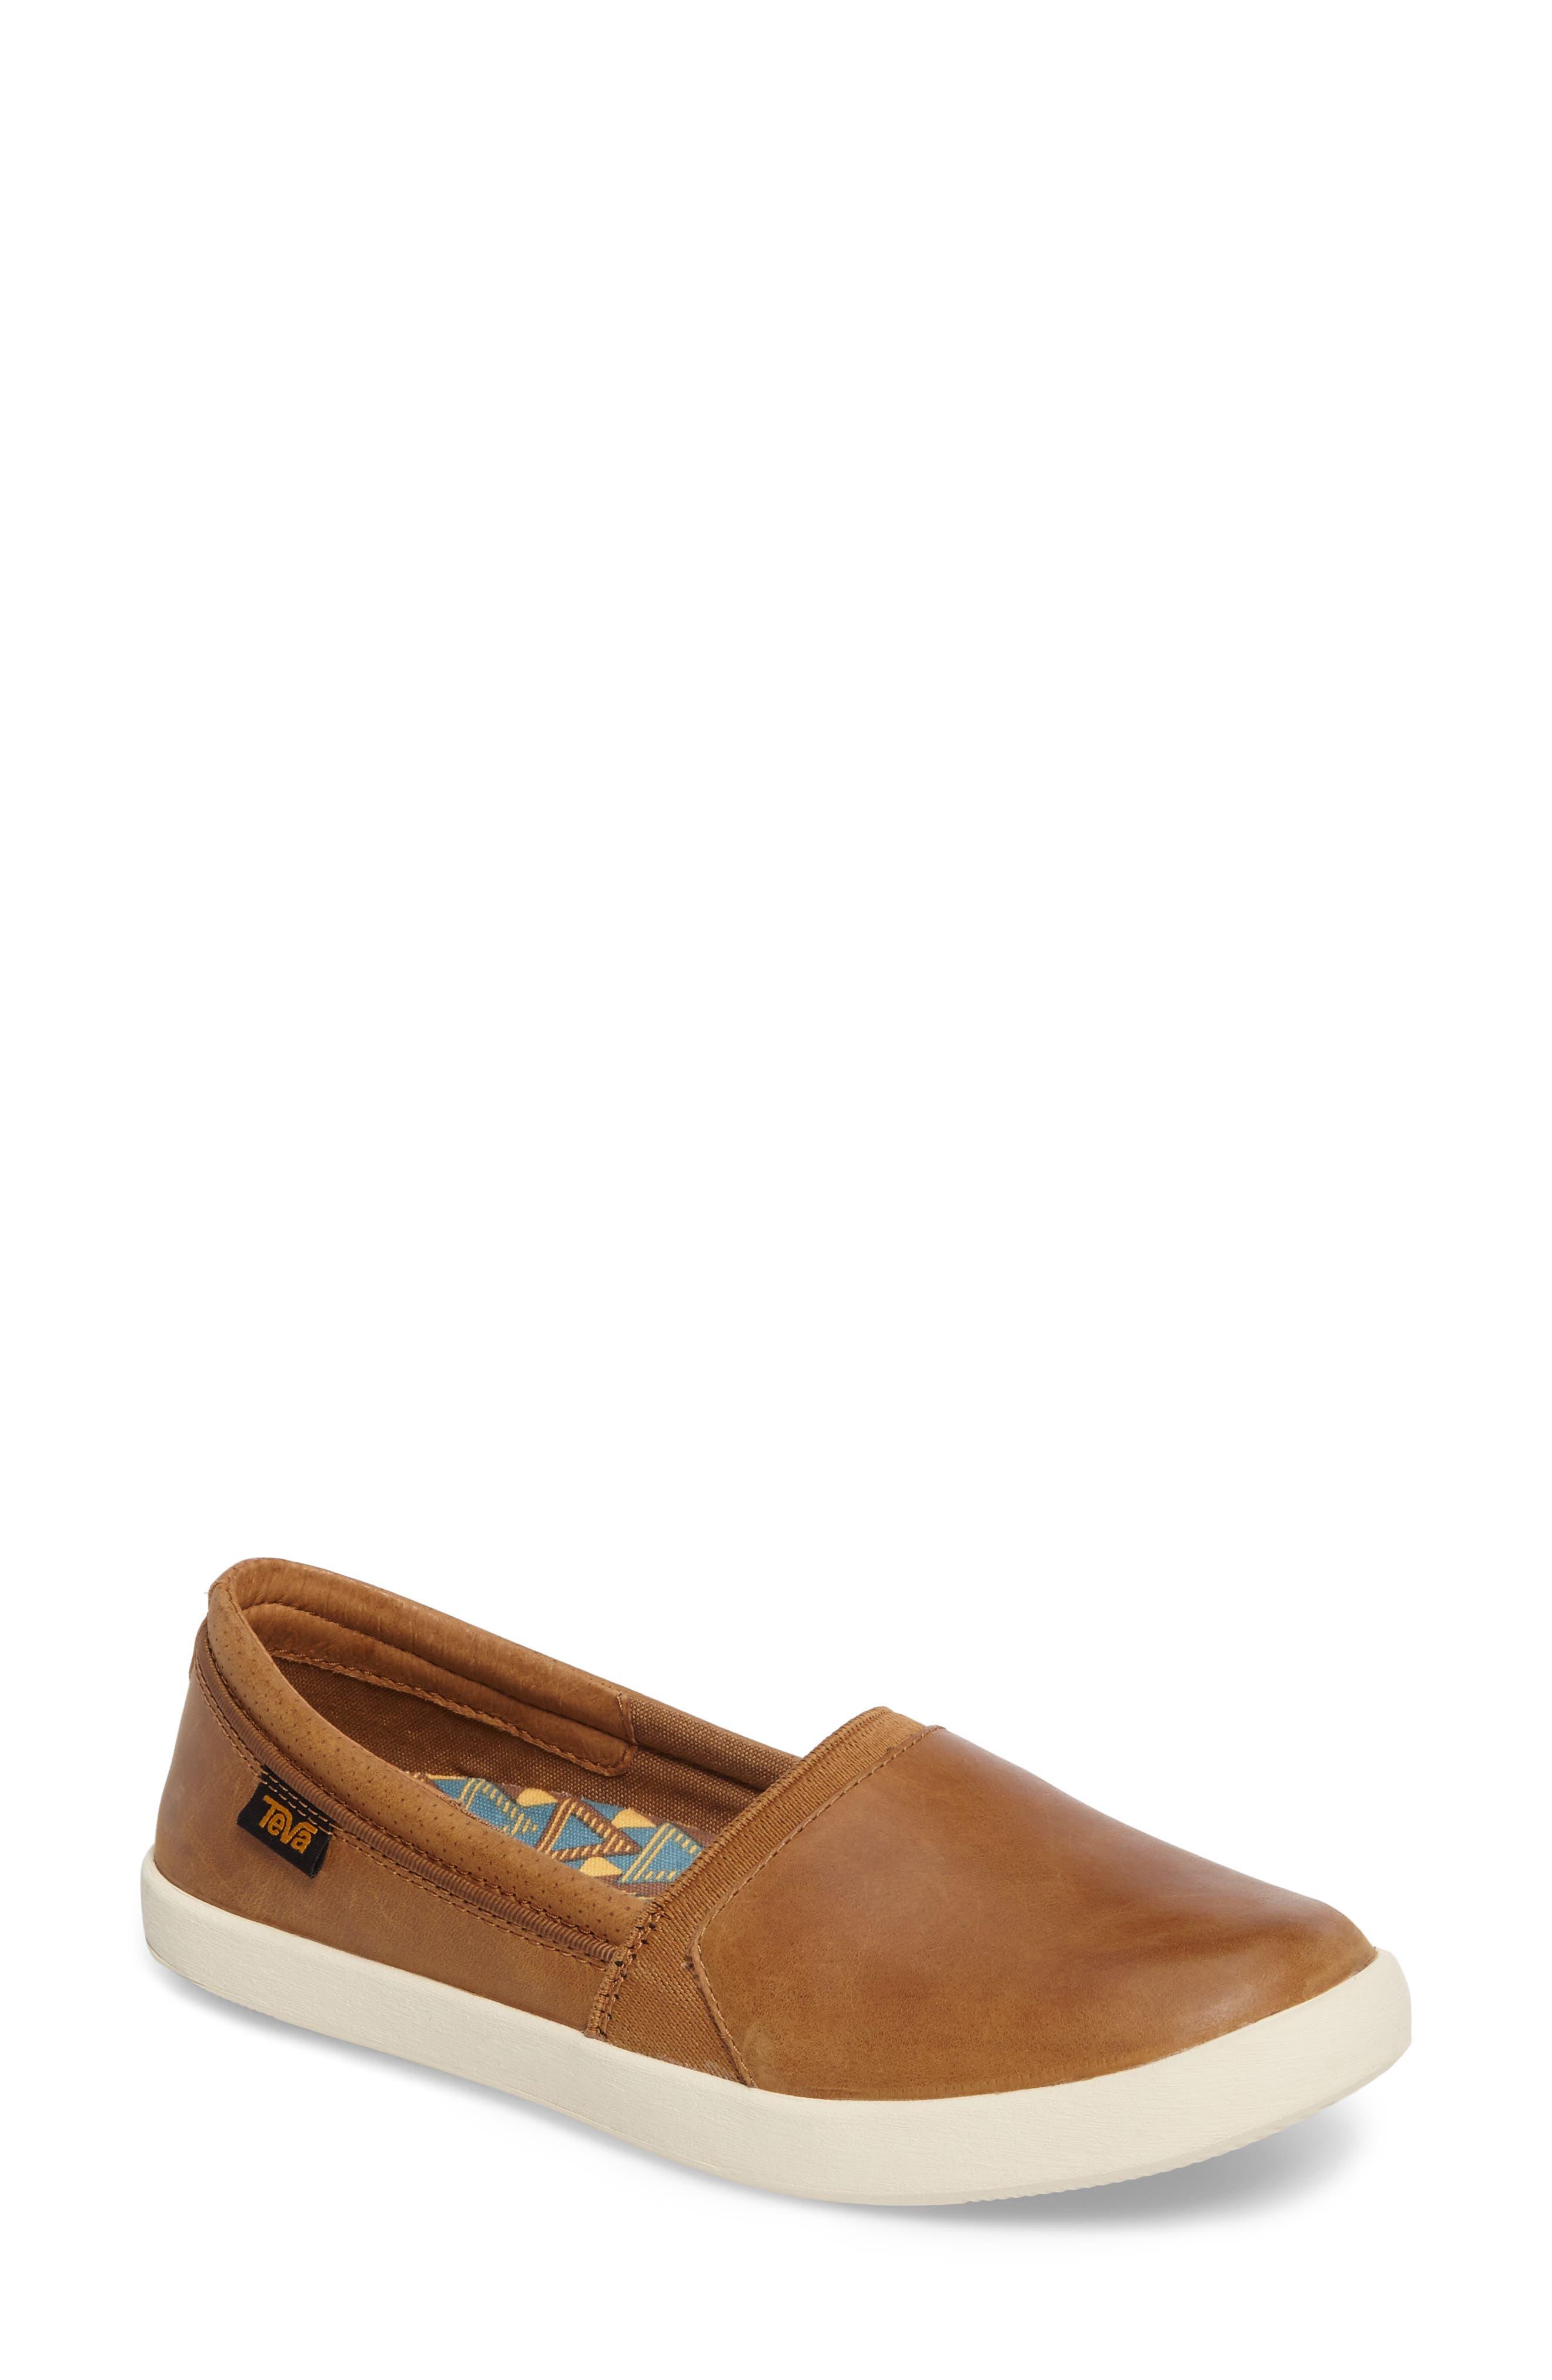 Willow Slip-On Sneaker,                             Main thumbnail 3, color,